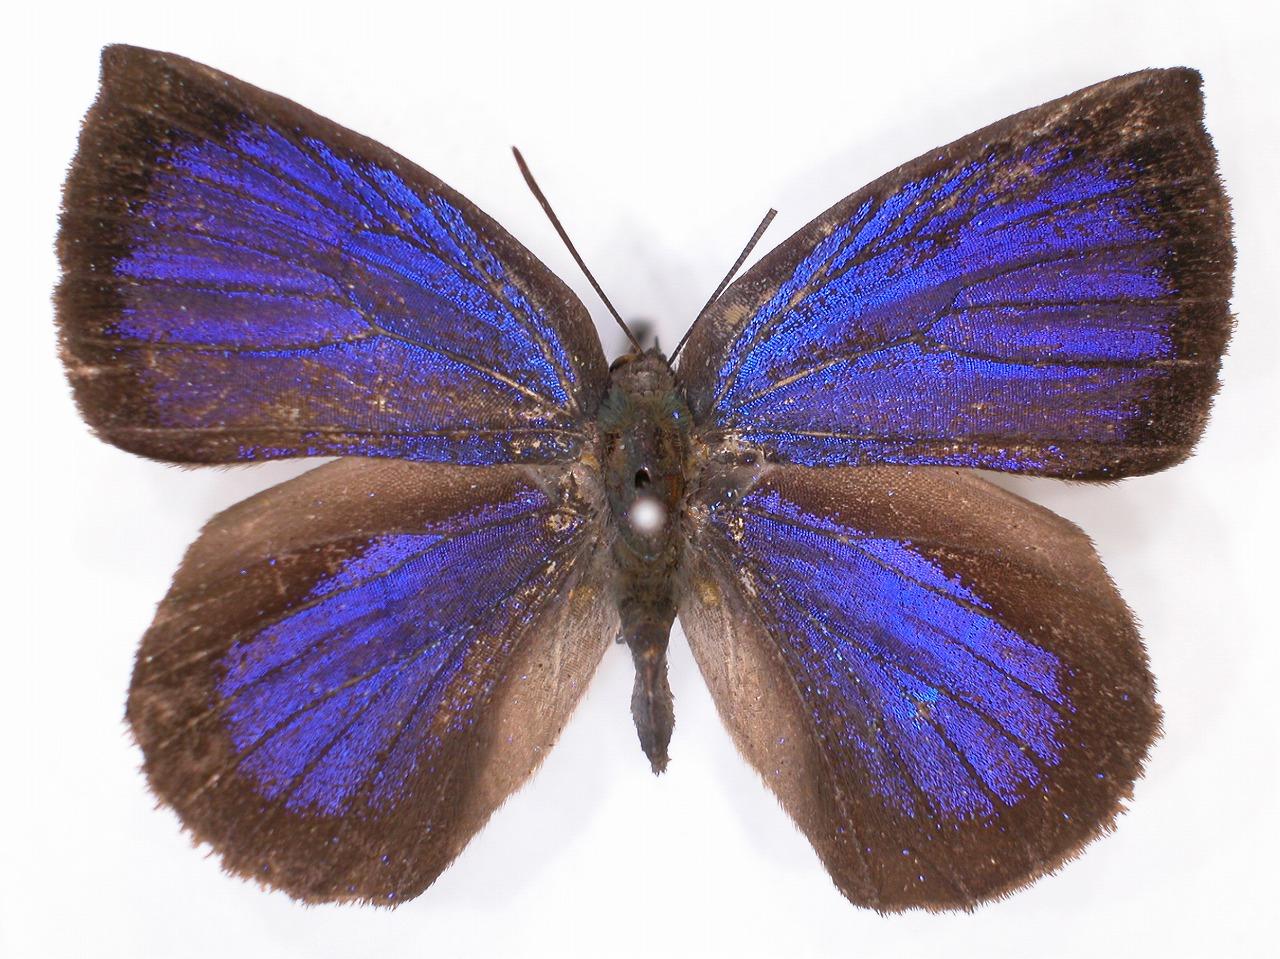 https://www.hitohaku.jp/material/l-material/butterfly-wing/5-lycaenidae/B1-638585_A.jpg